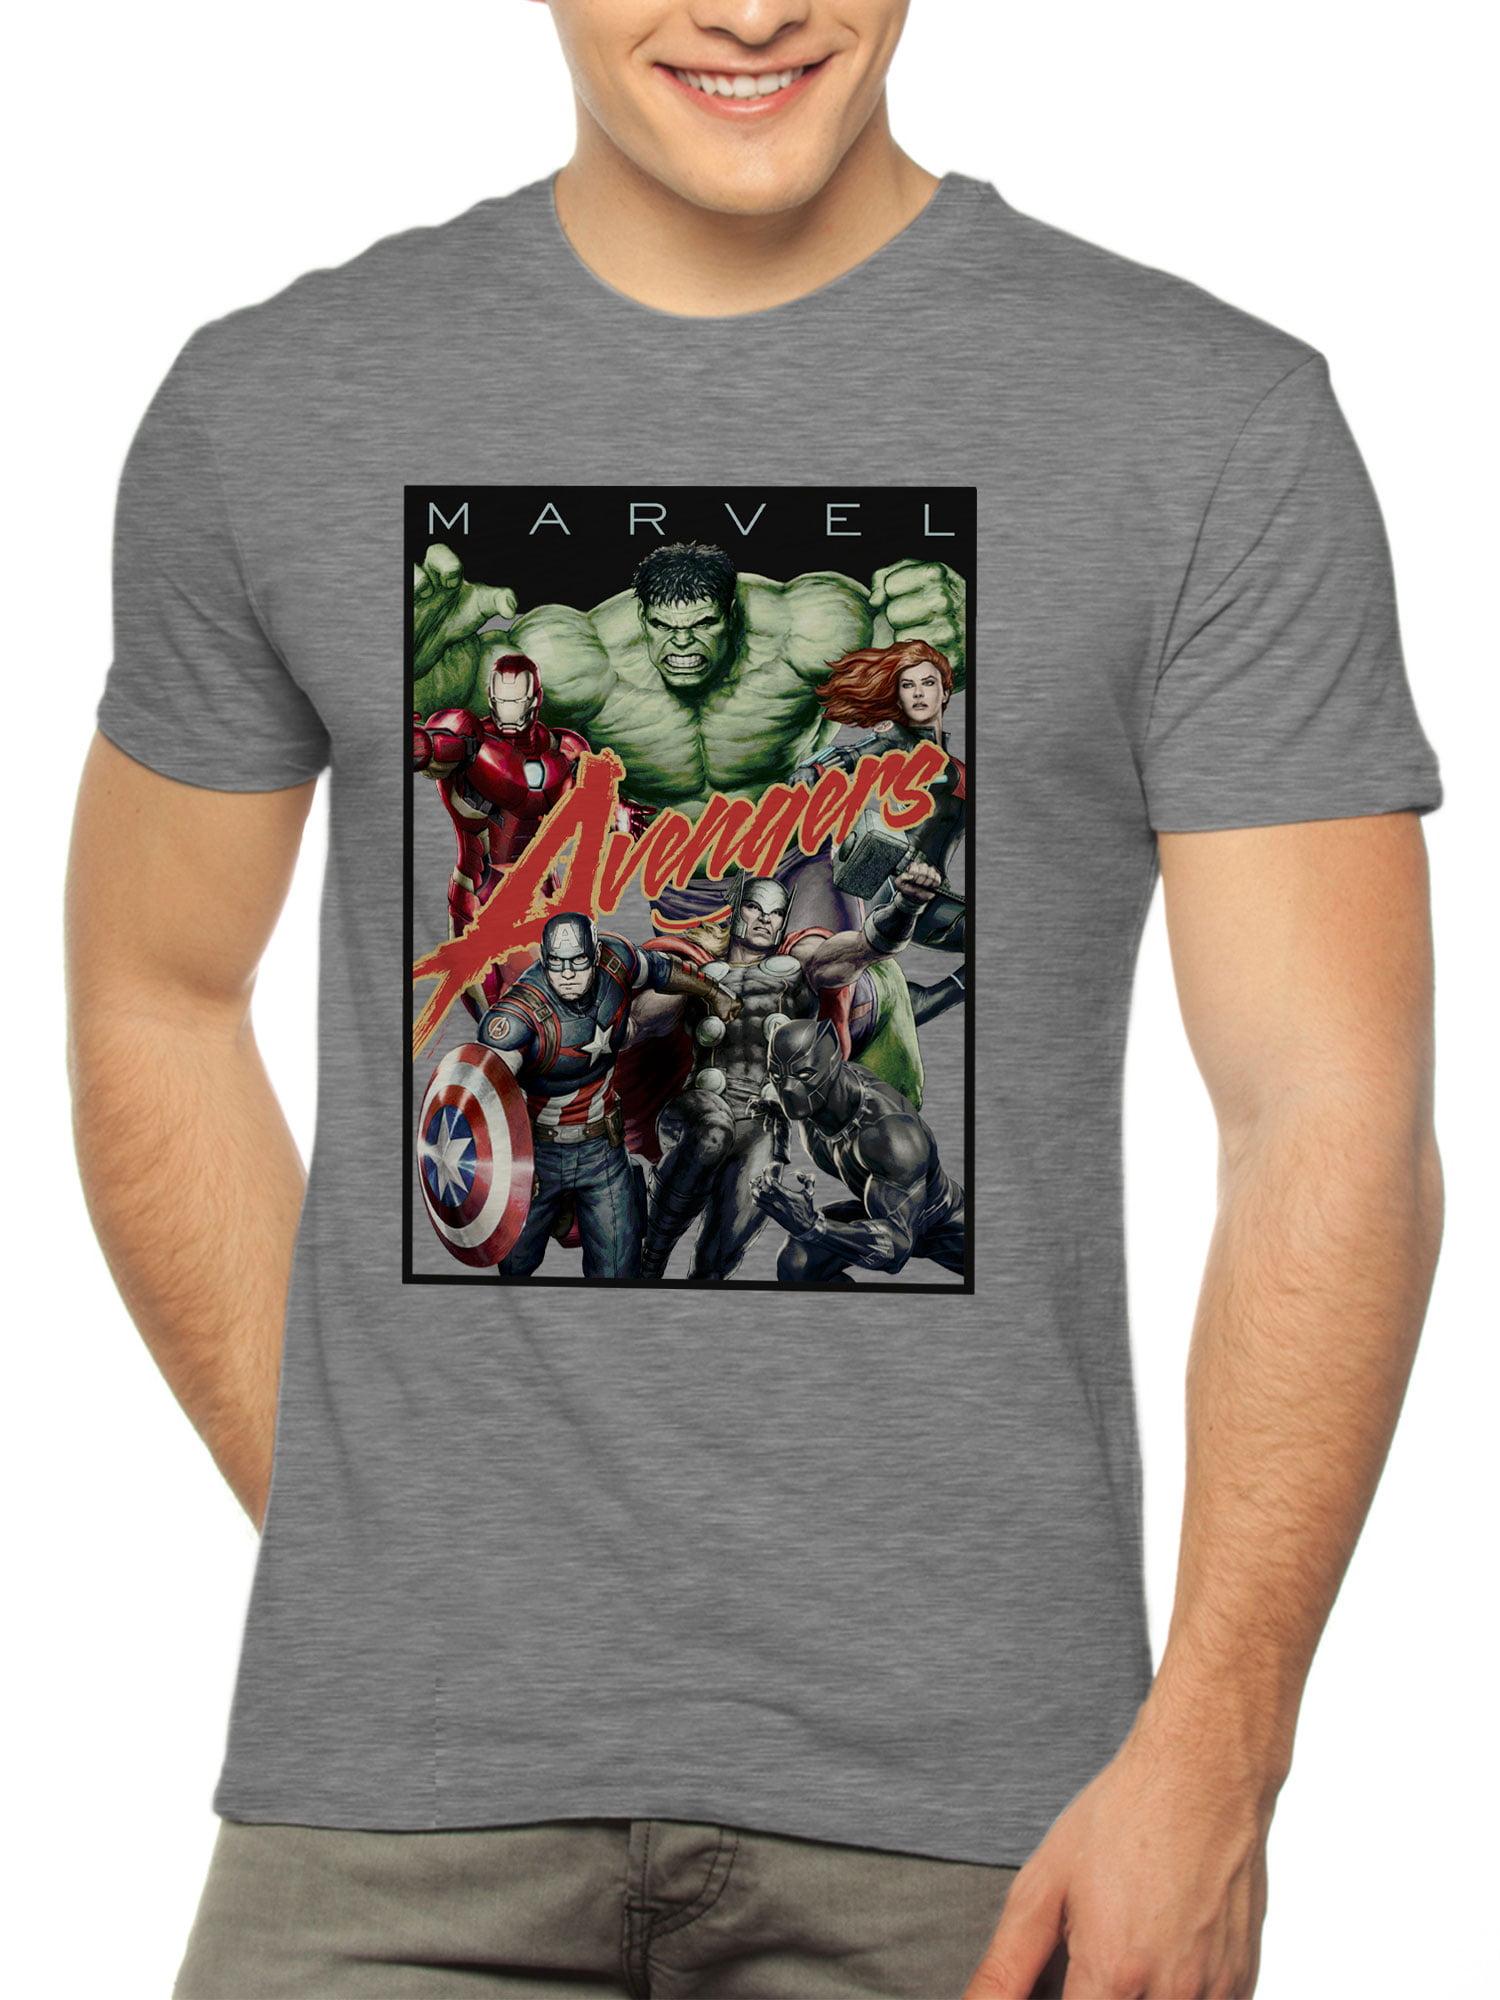 Men's Marvel Avengers Short Sleeve Graphic T-Shirt, up to 2XL